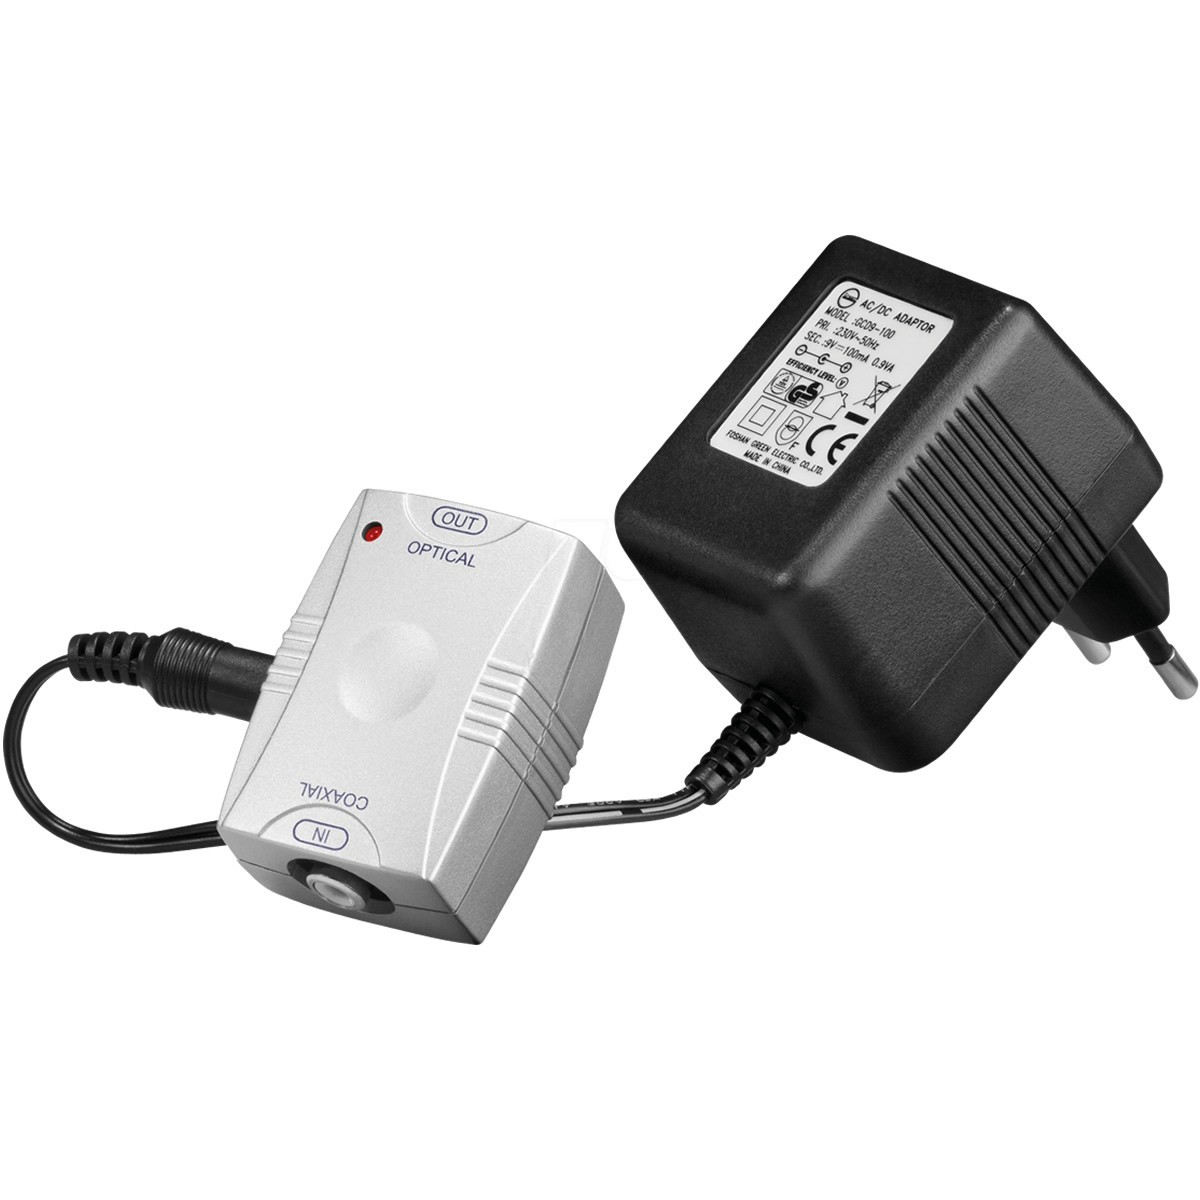 Adaptateur Convertisseur SPDIF Coaxial vers Toslink optique